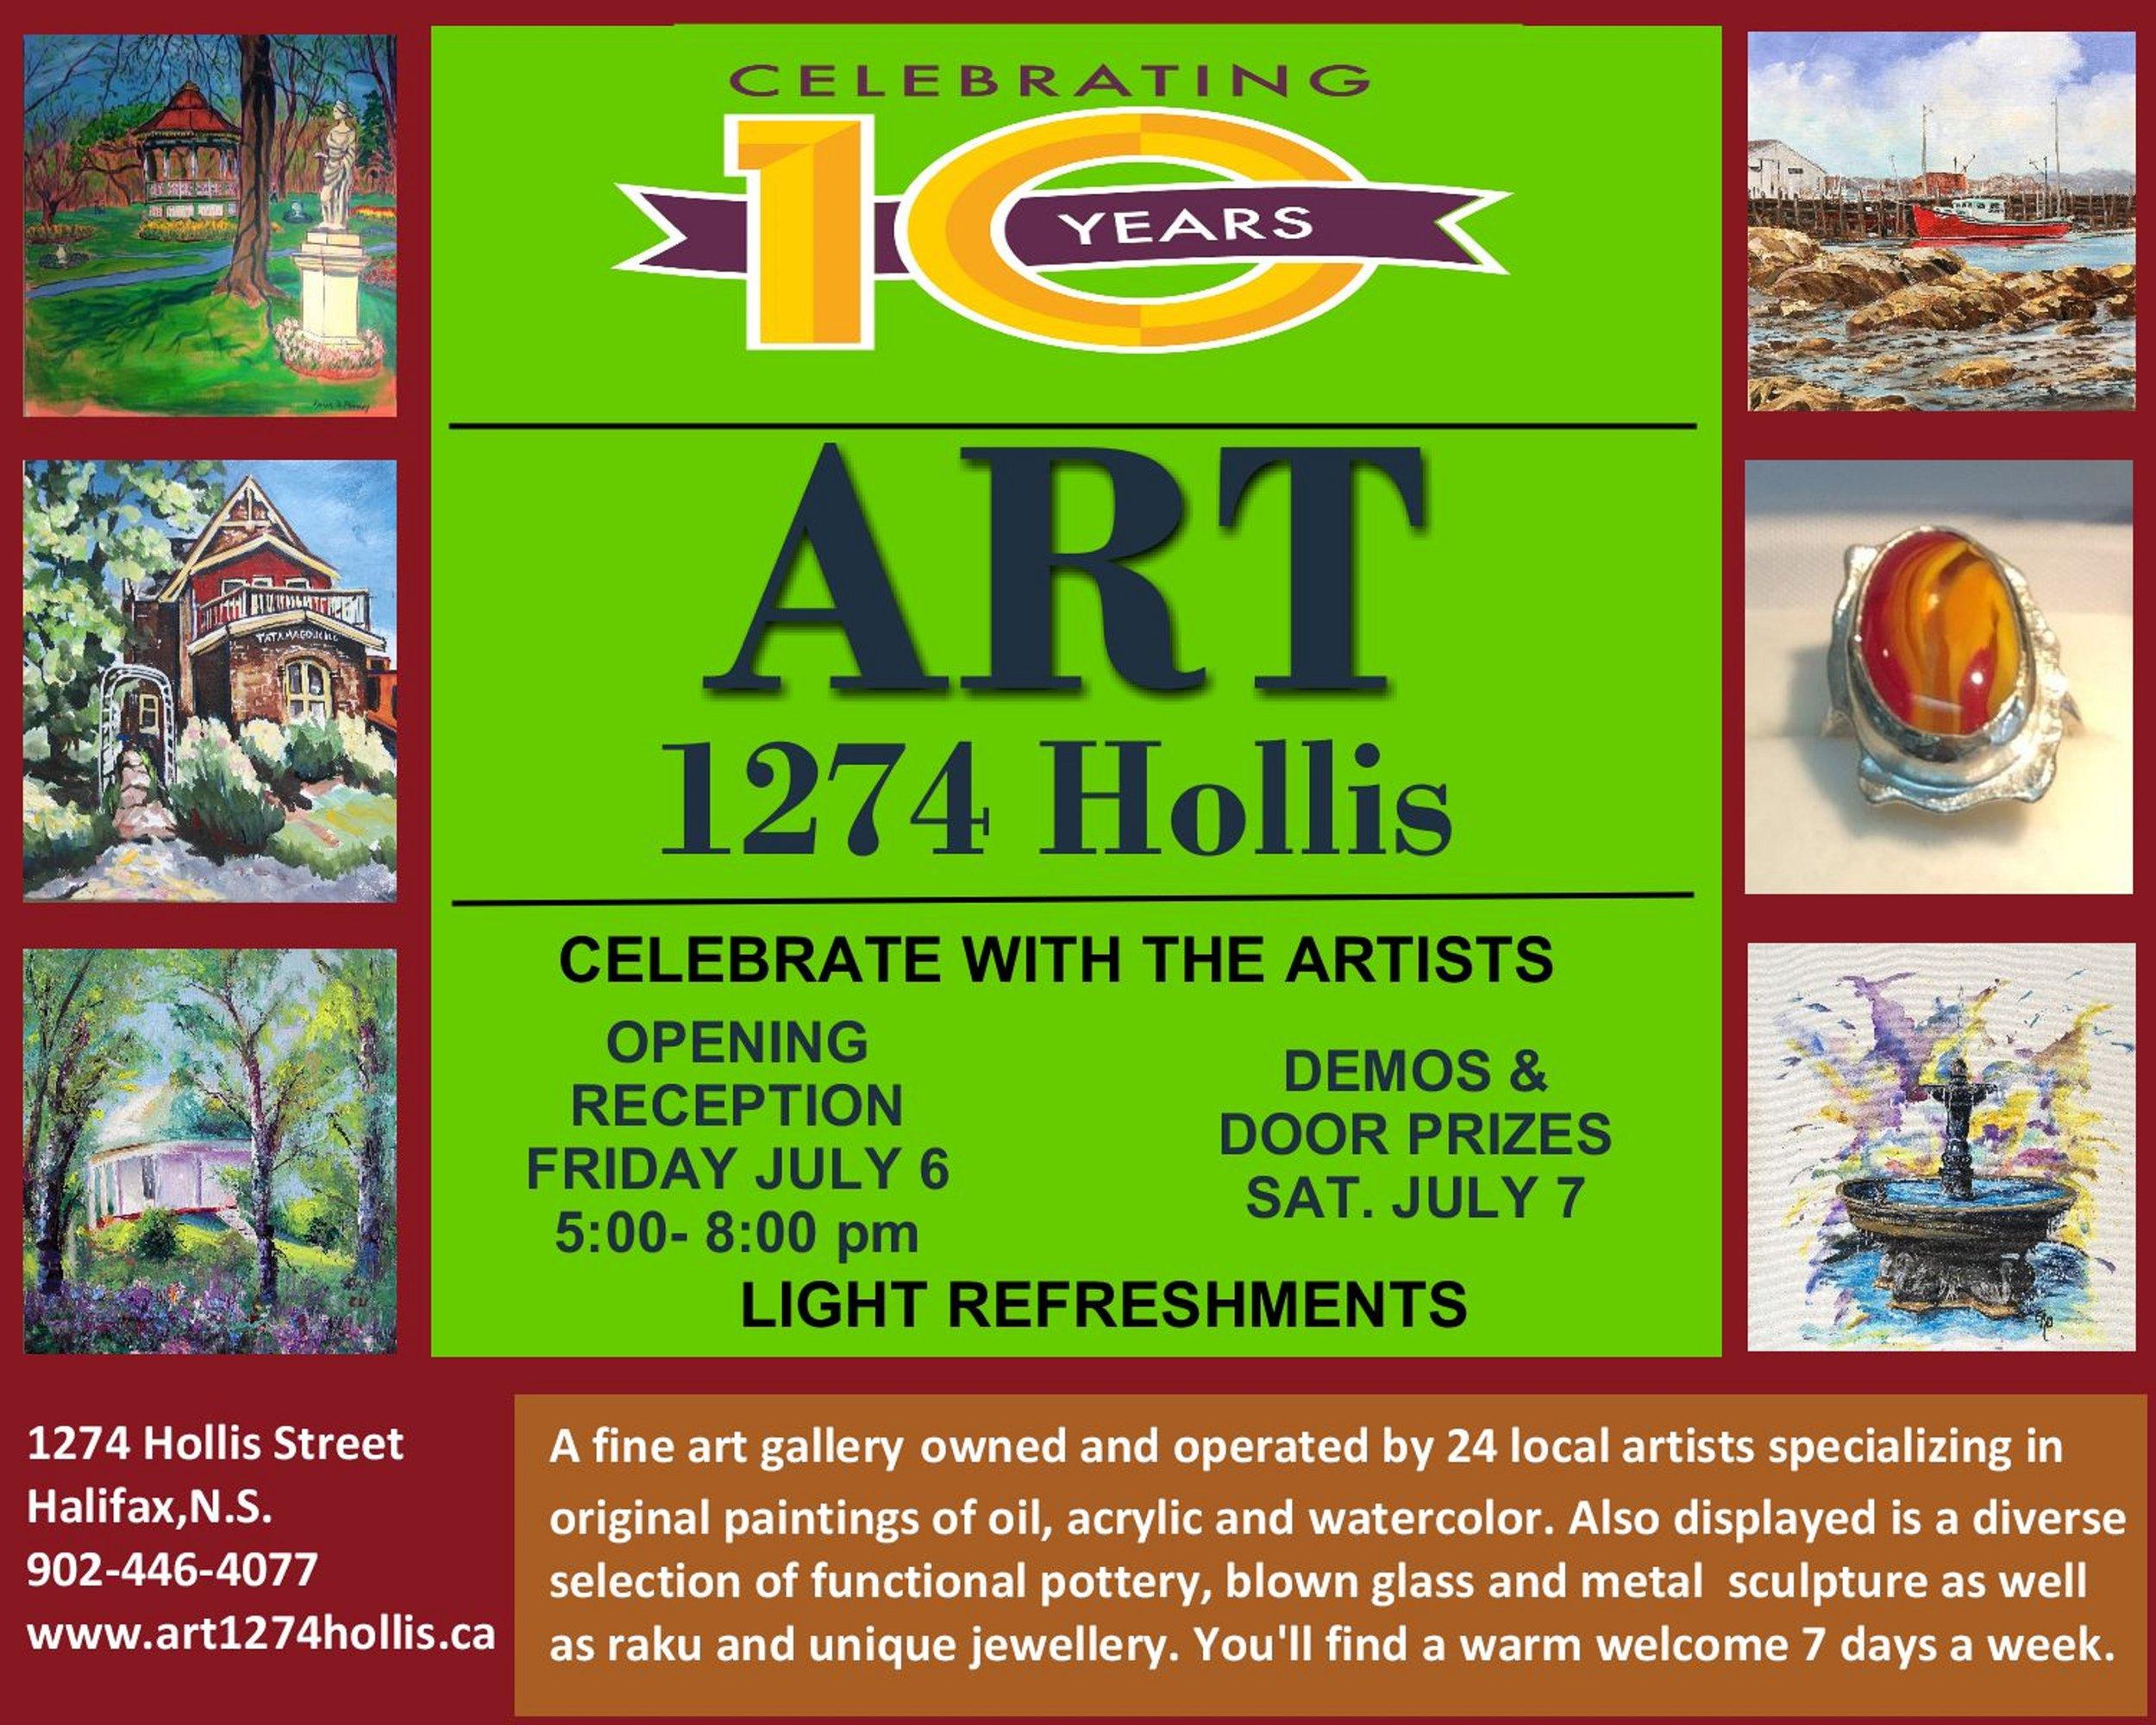 Art 1274 Hollis  10th Postcard#2-001.jpg